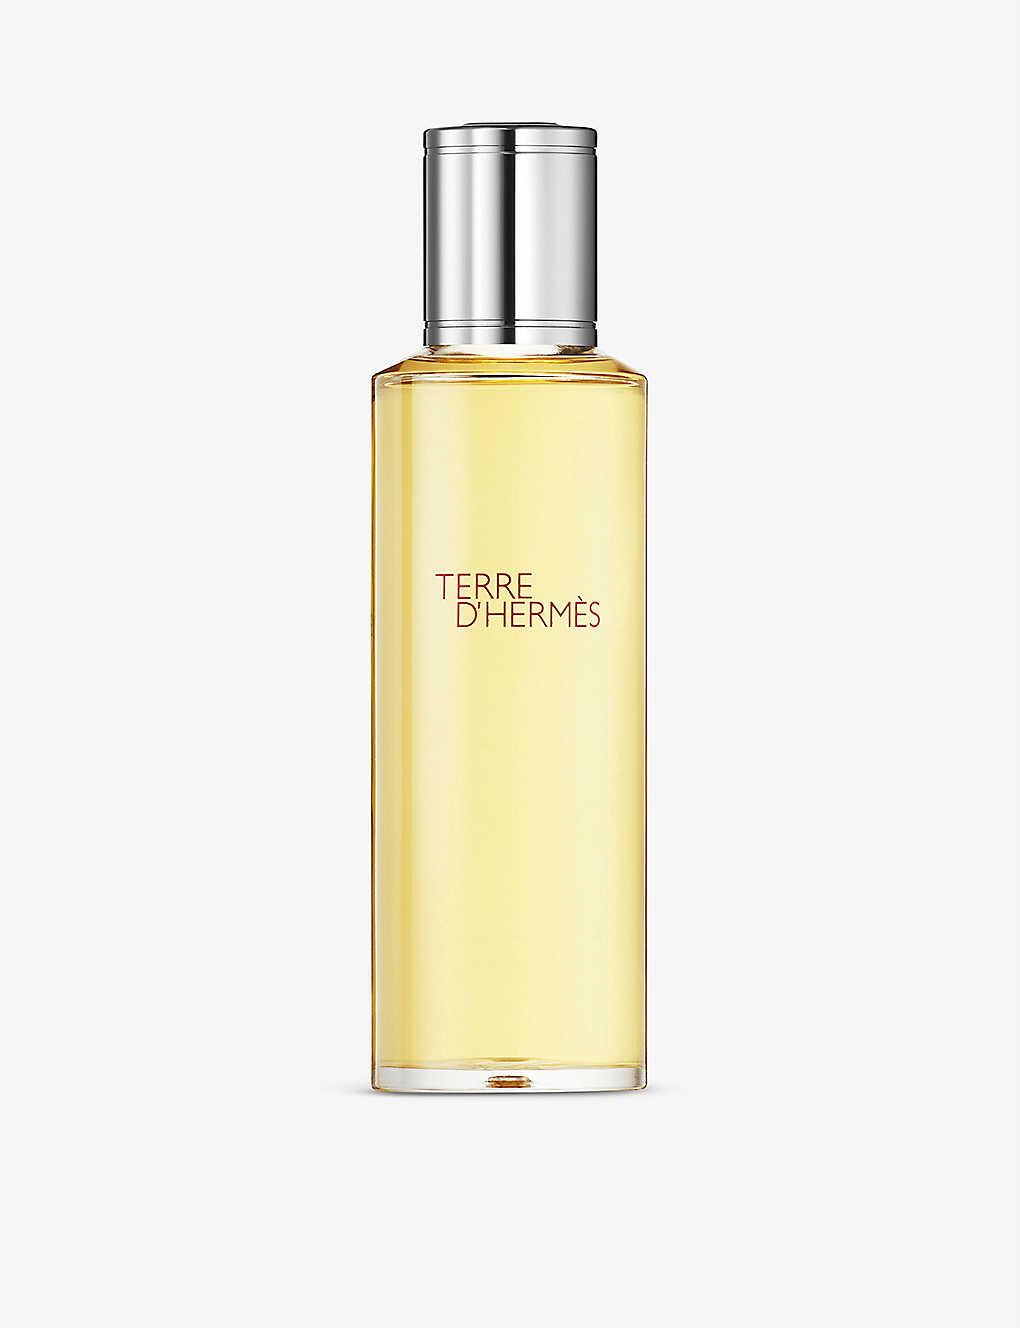 Hermes Terre Dhermès Eau De Parfum Refill 125ml Selfridgescom